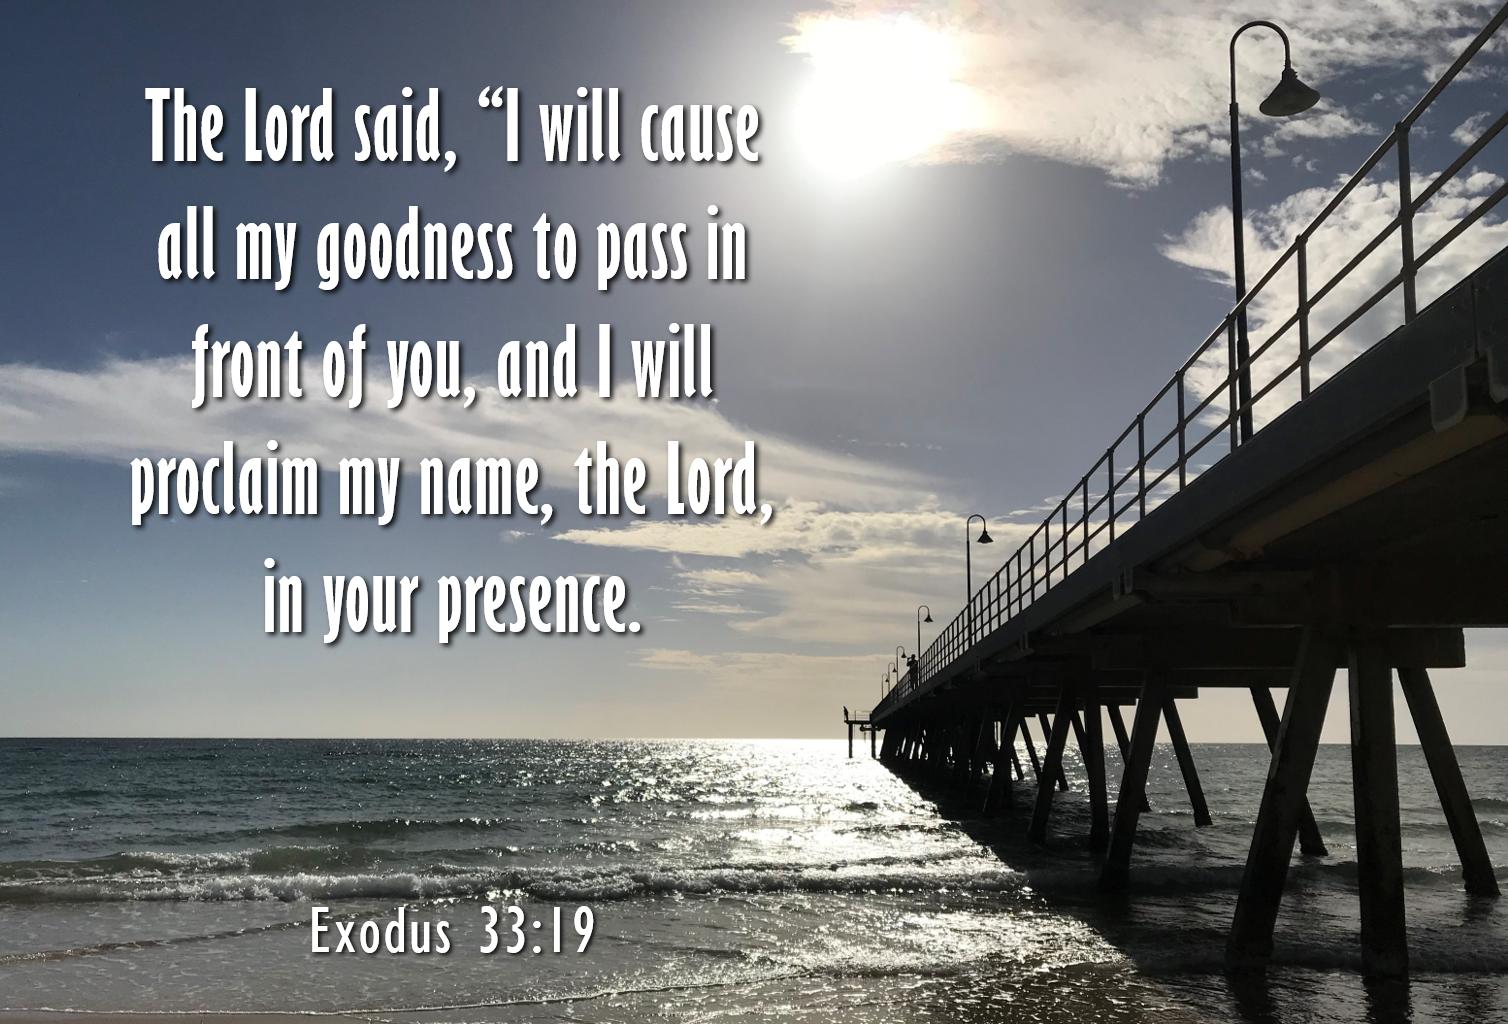 A Glimpse of God